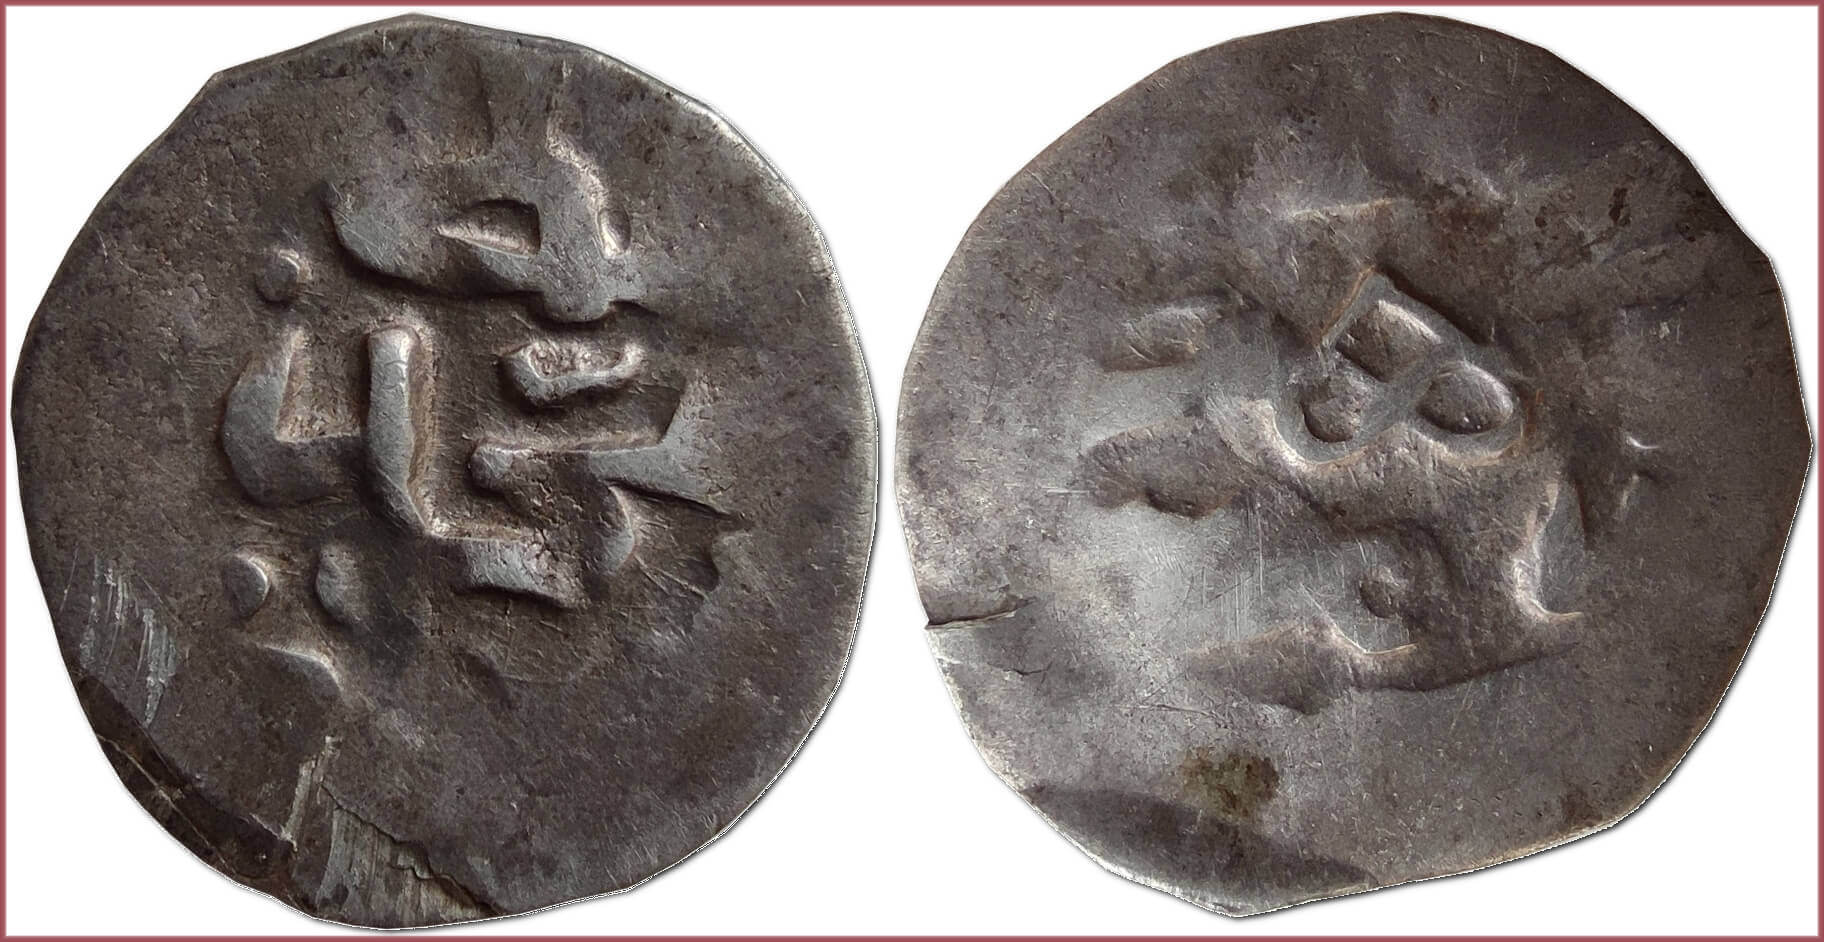 Medini, 1648 (AH 1058): Ottoman Empire